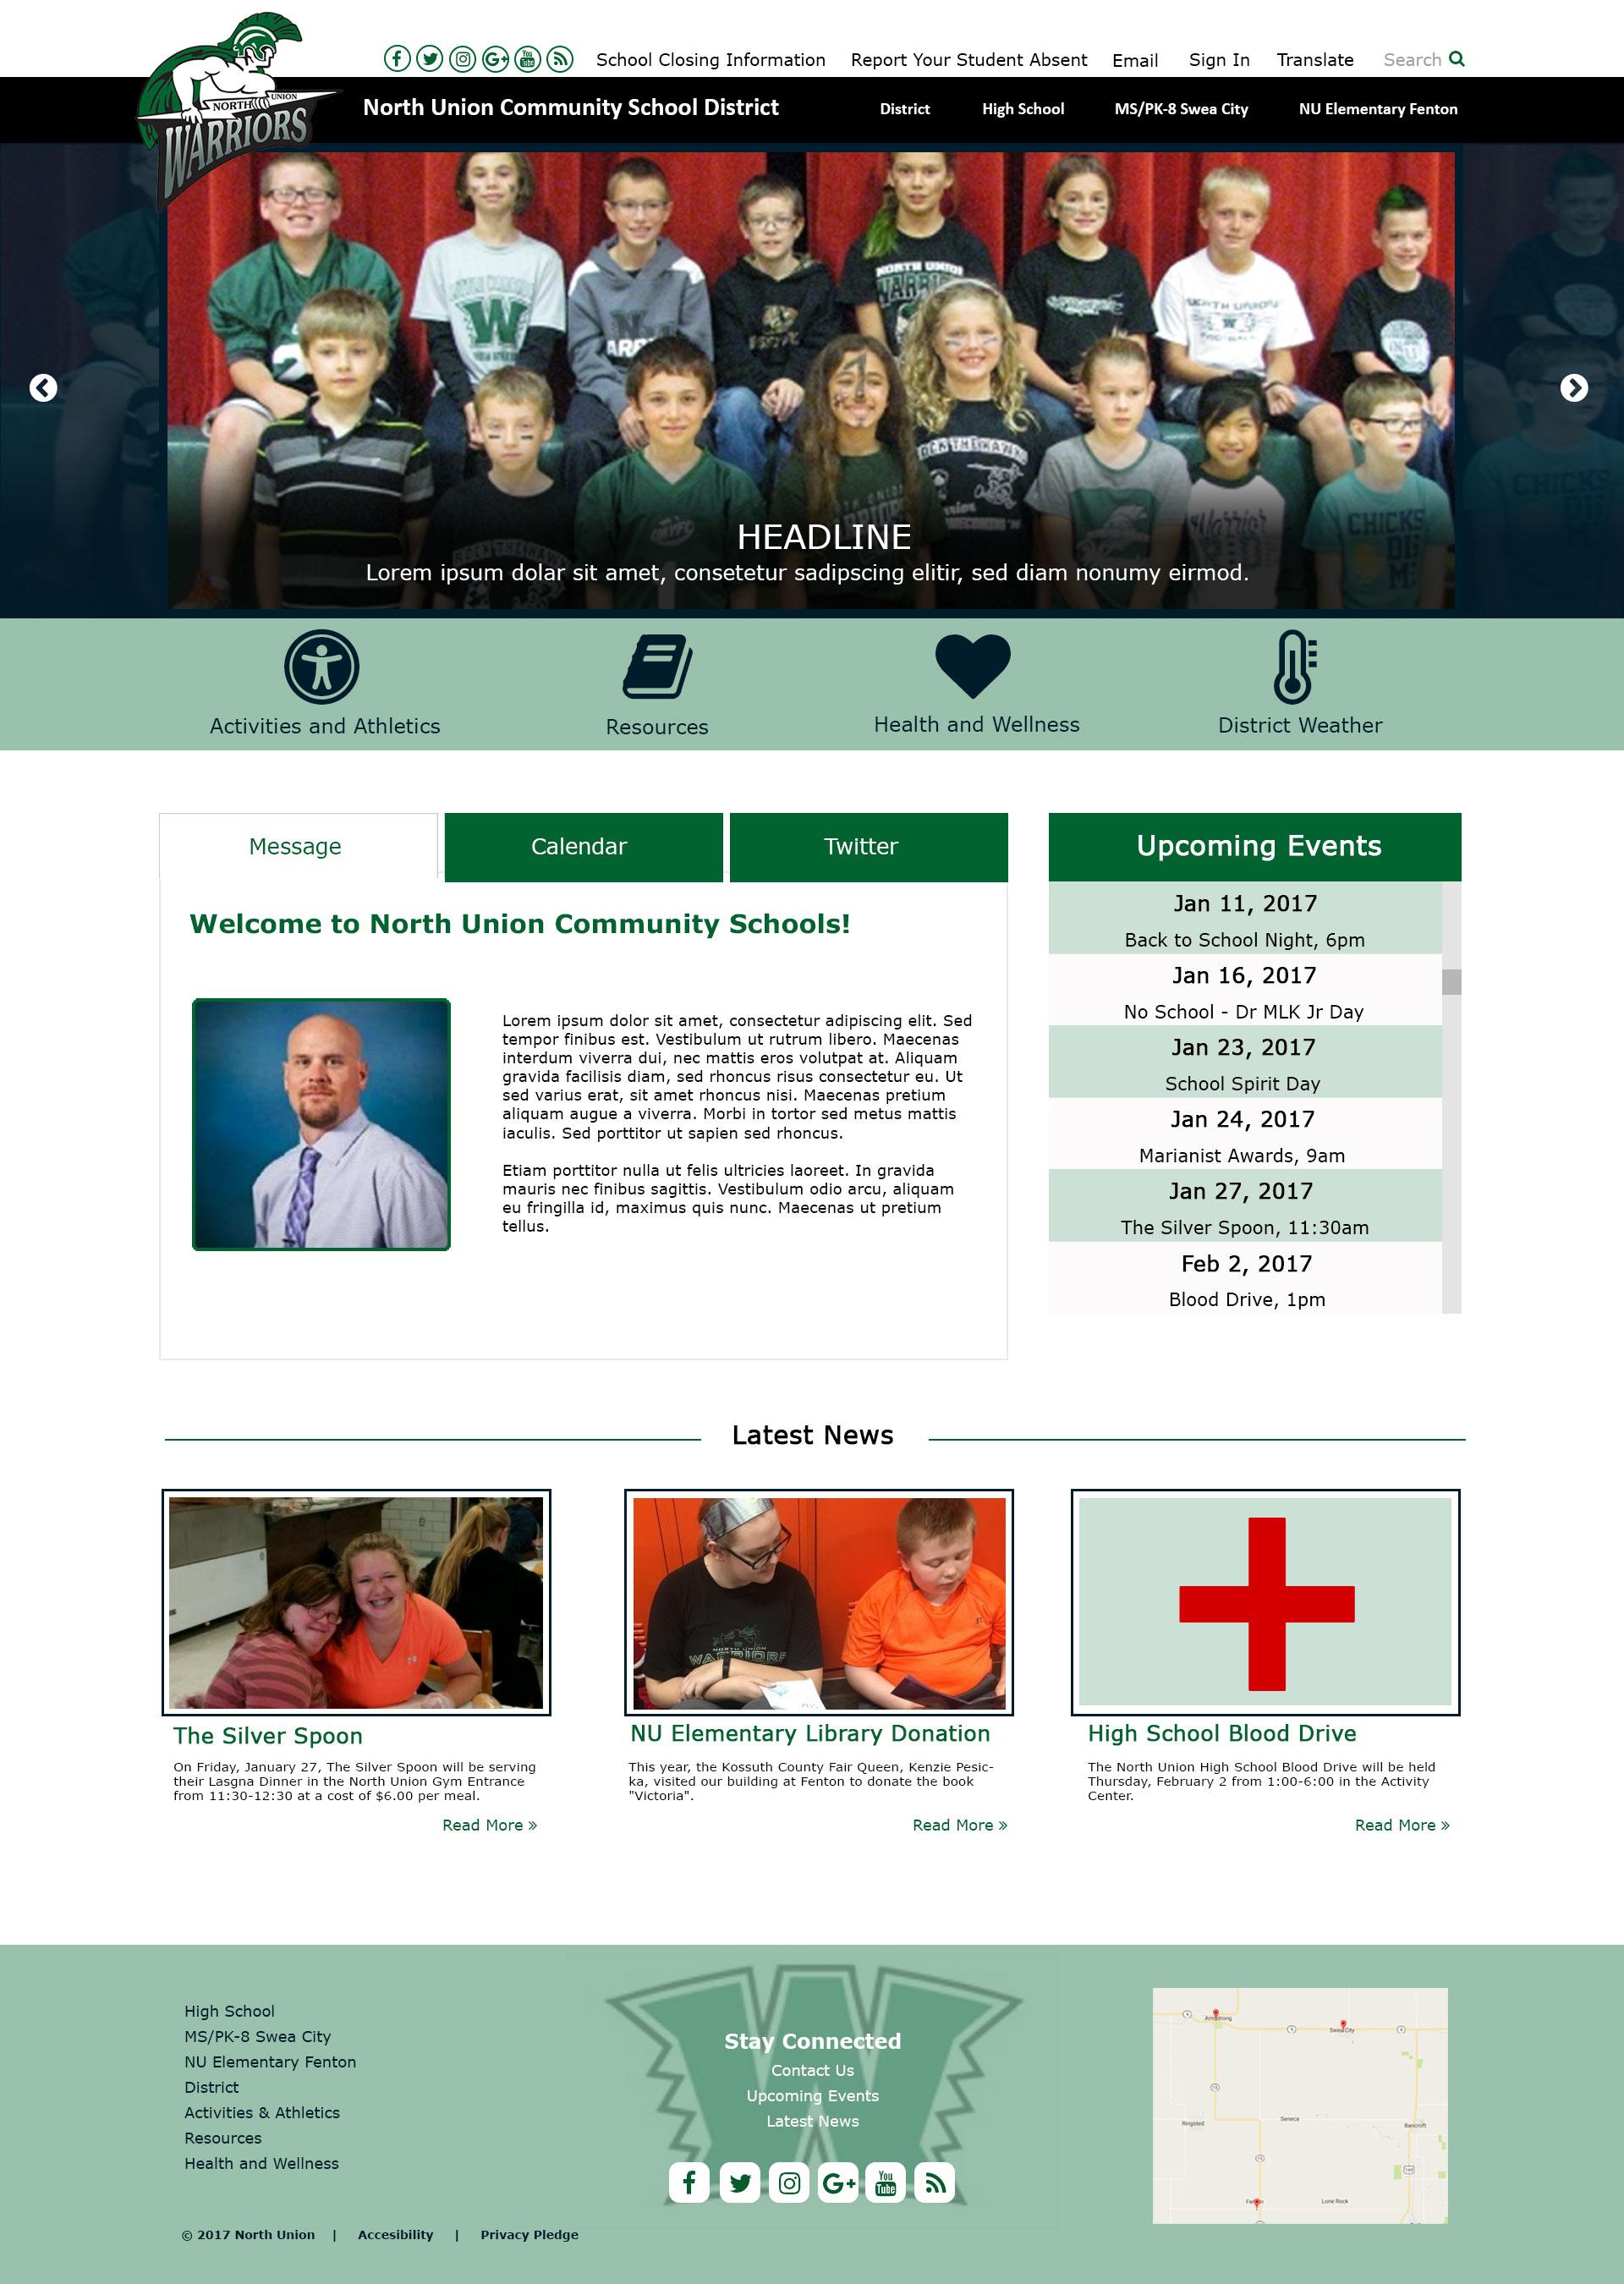 Design #2 - Homepage